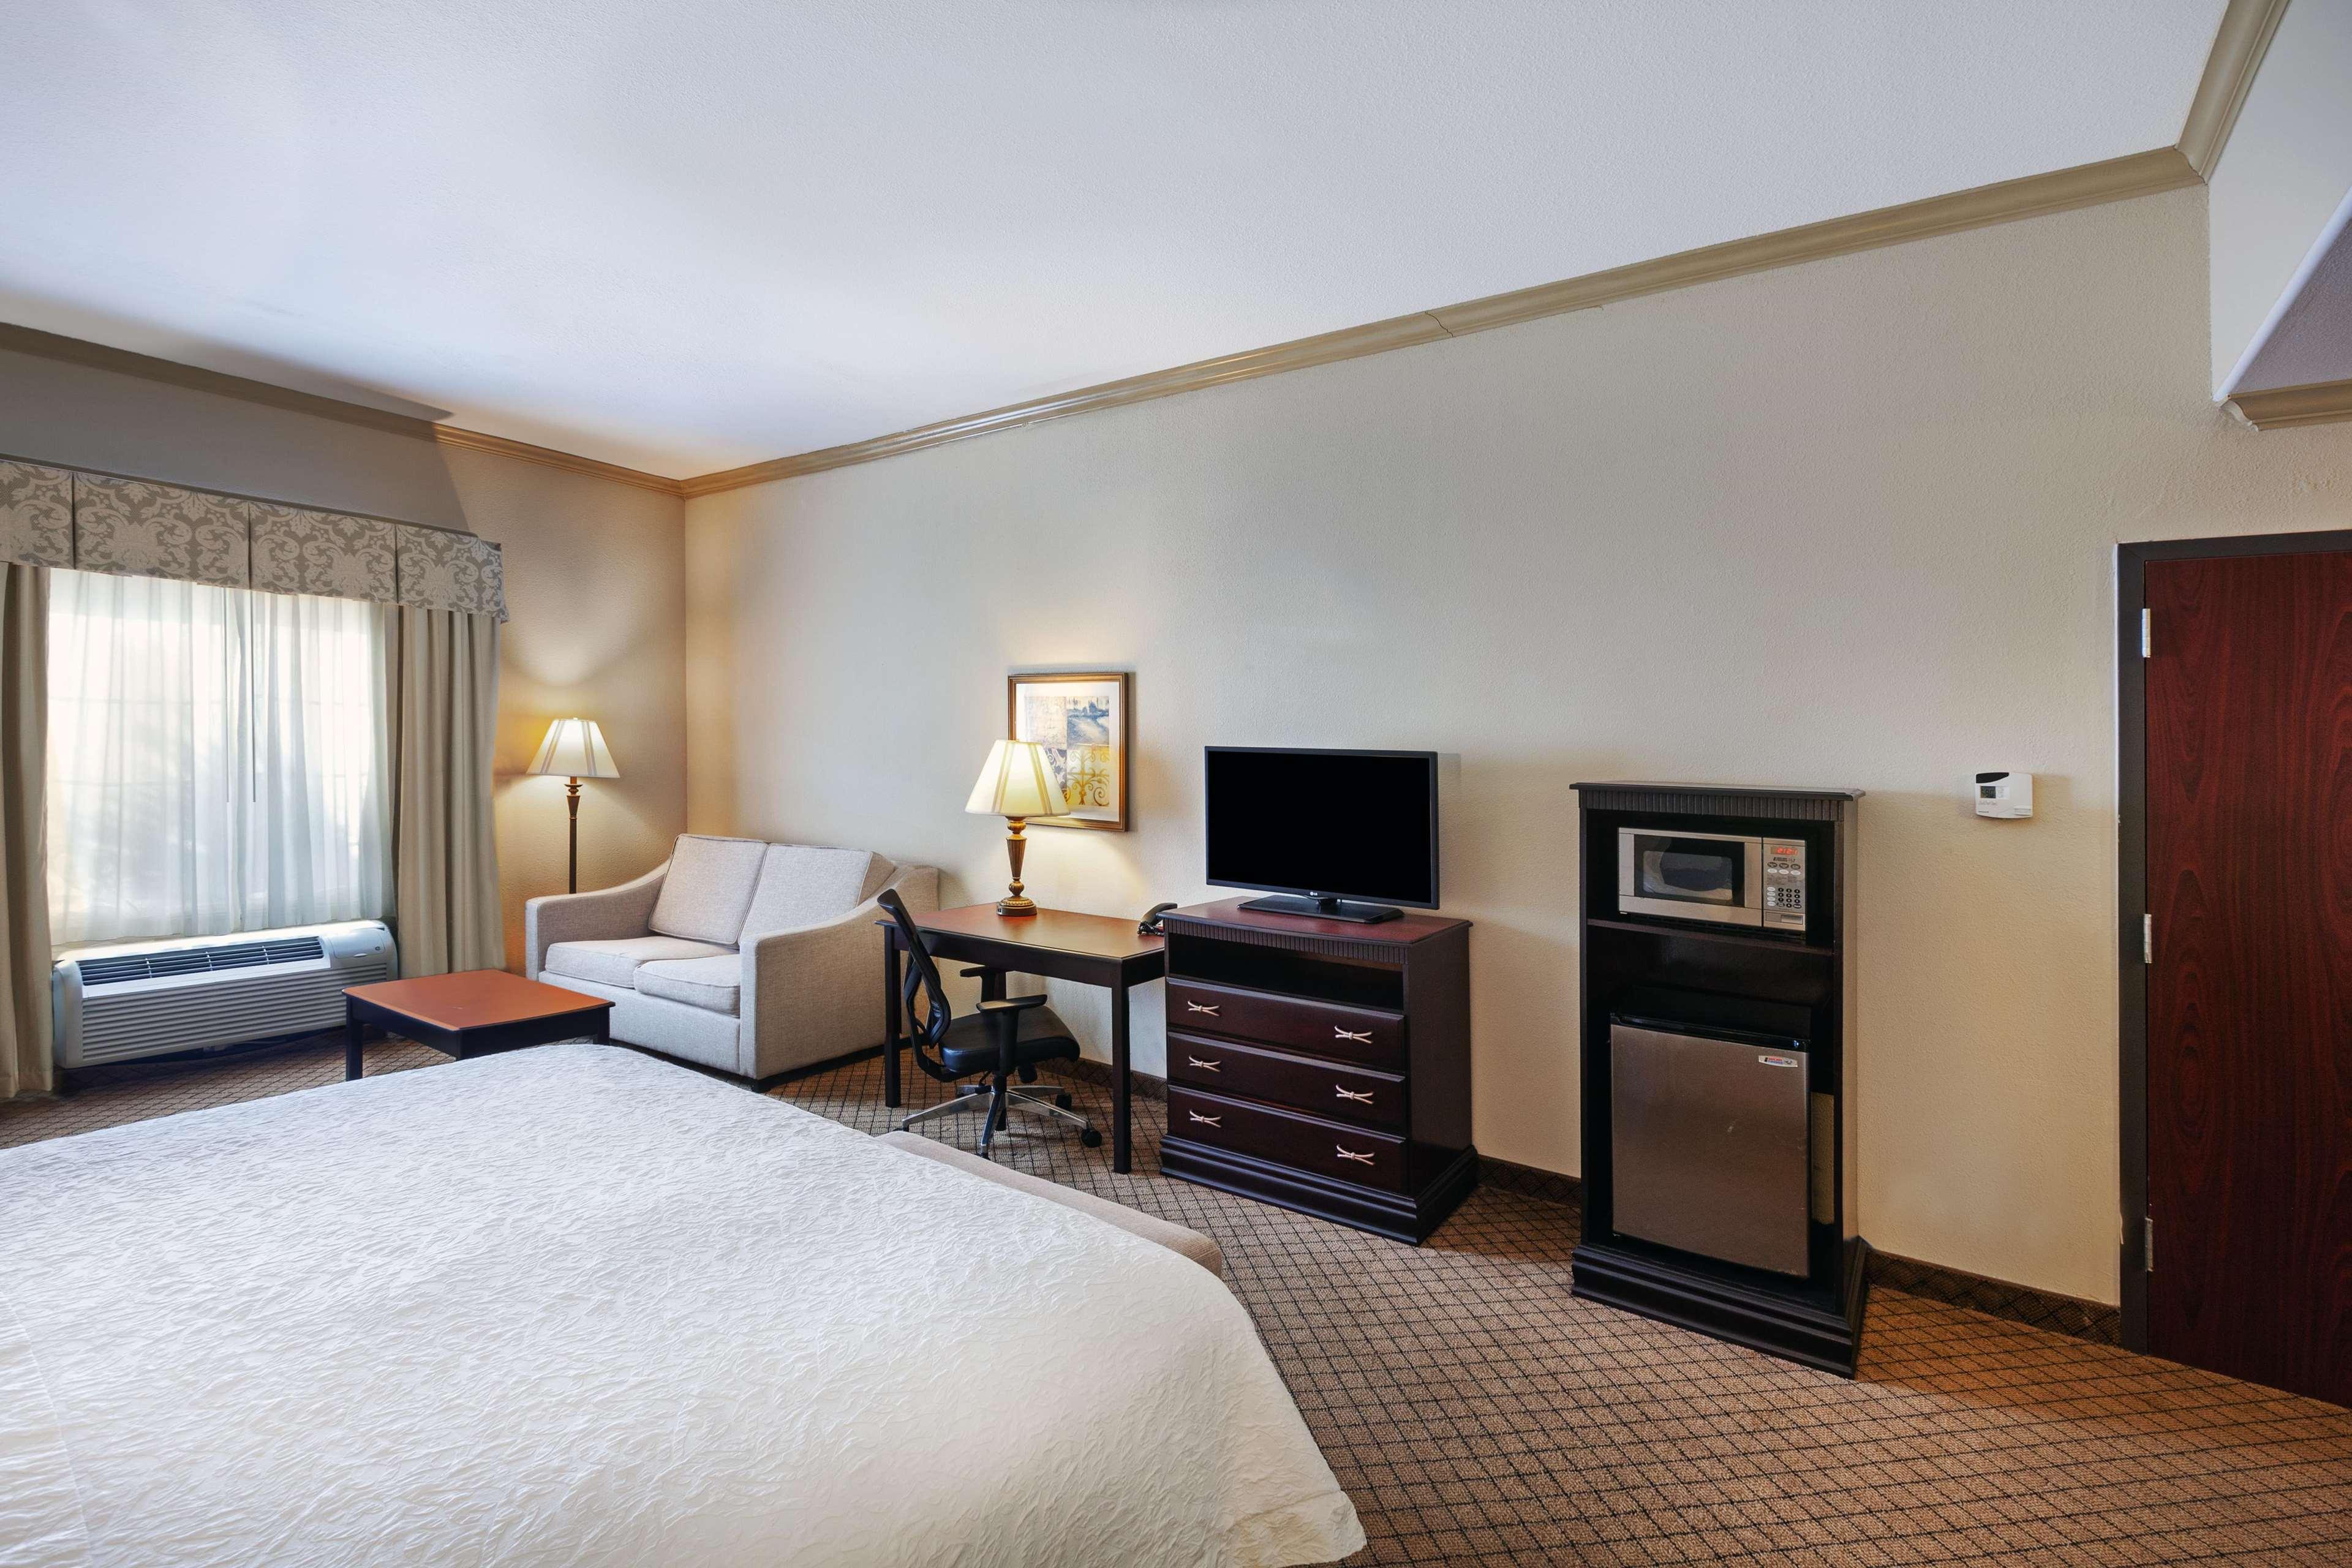 Hampton Inn & Suites Galveston image 23